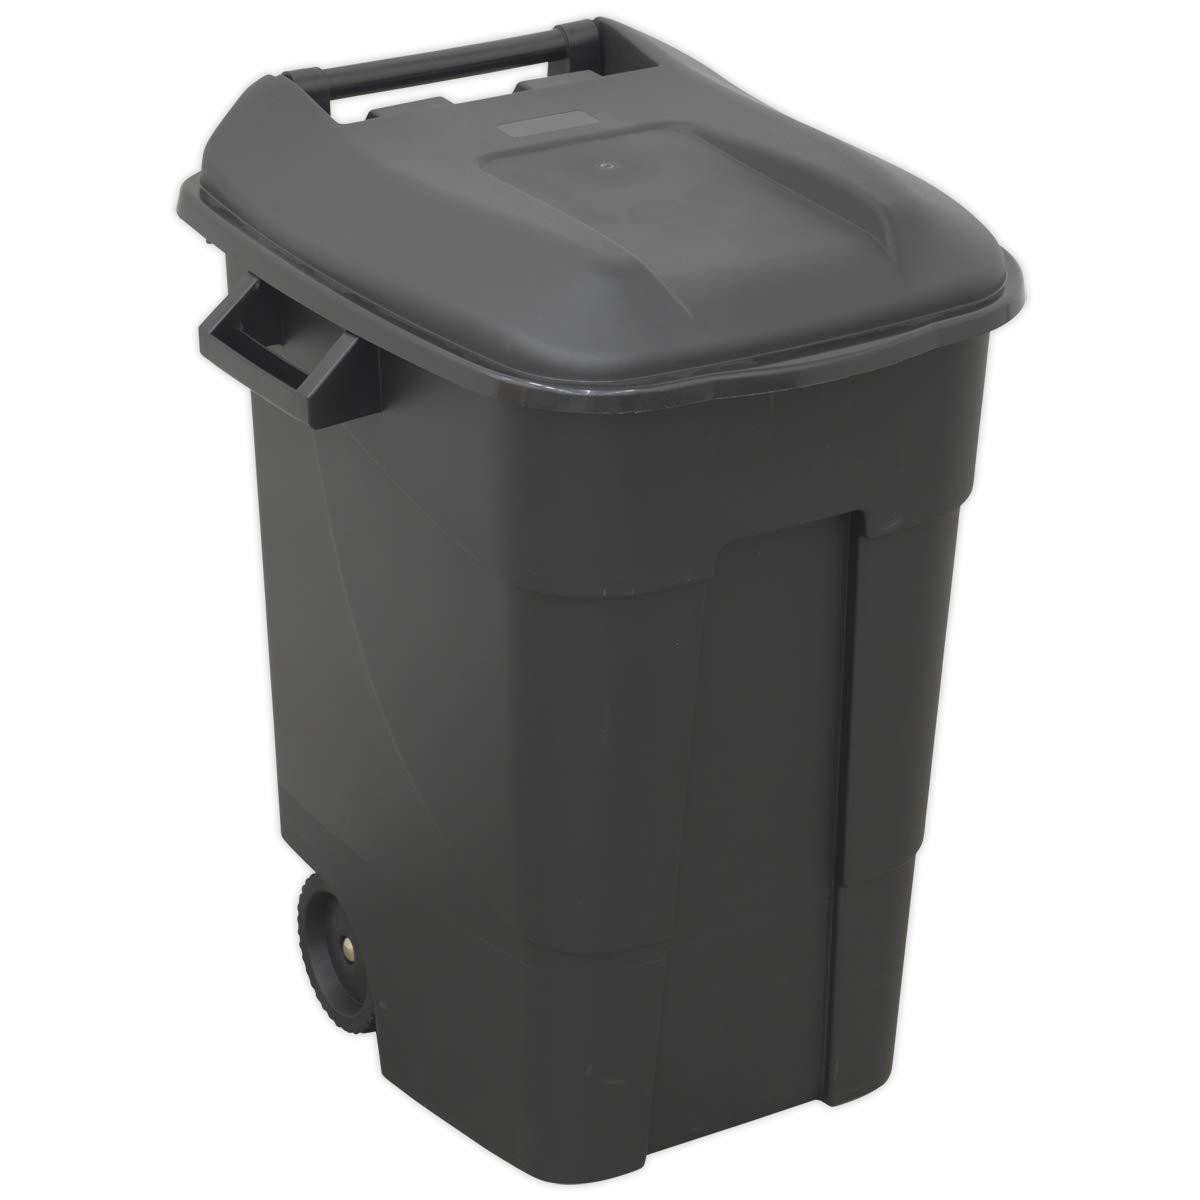 Sealey BM100 Wheelie Bin, Black, 250 Litre